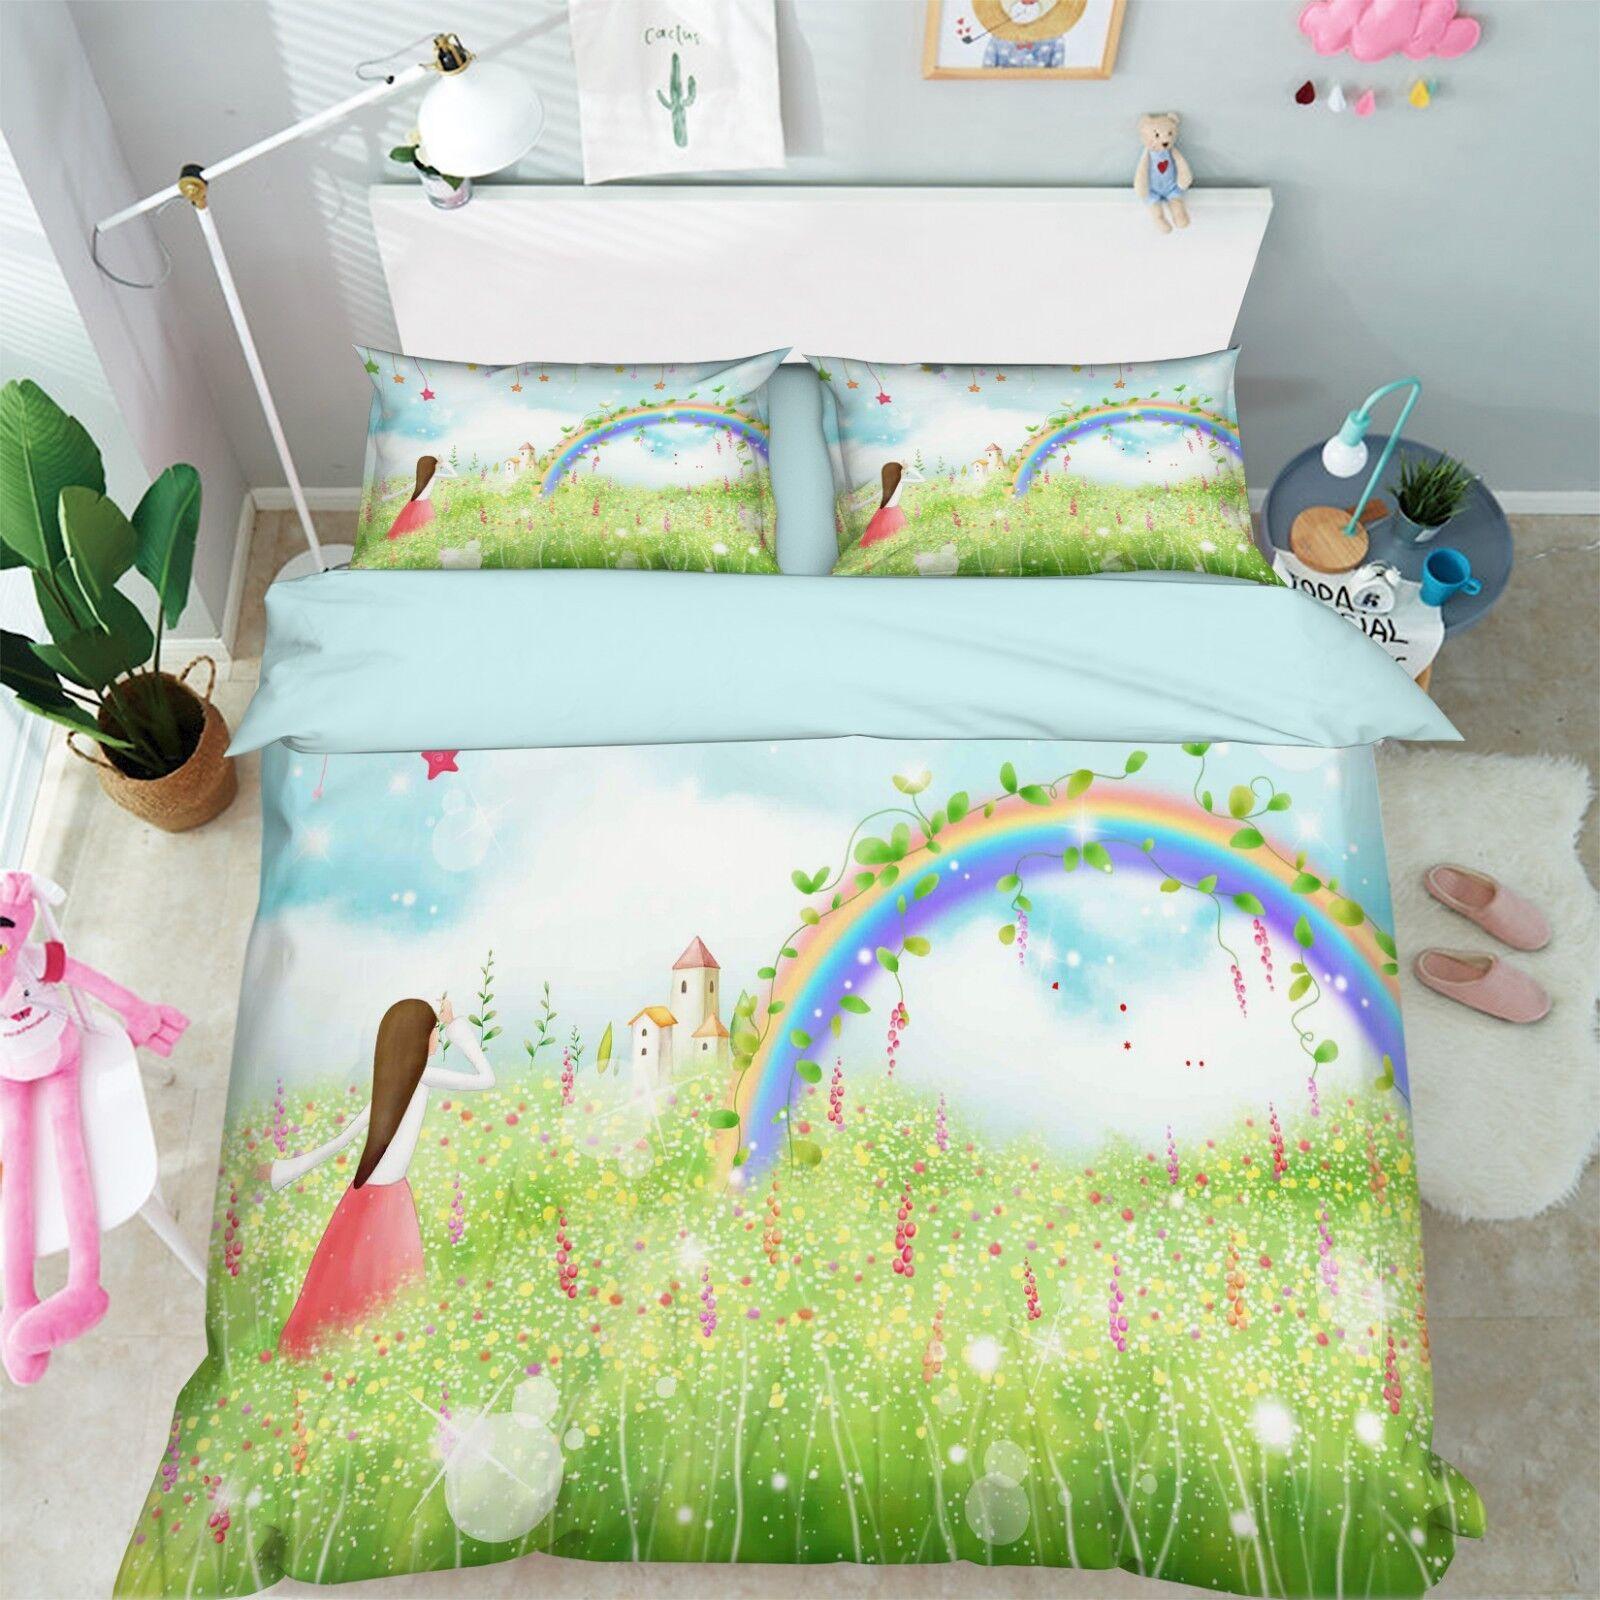 3D Grass Girl Sky 66 Bed Pillowcases Quilt Duvet Cover Set Single Queen AU Carly